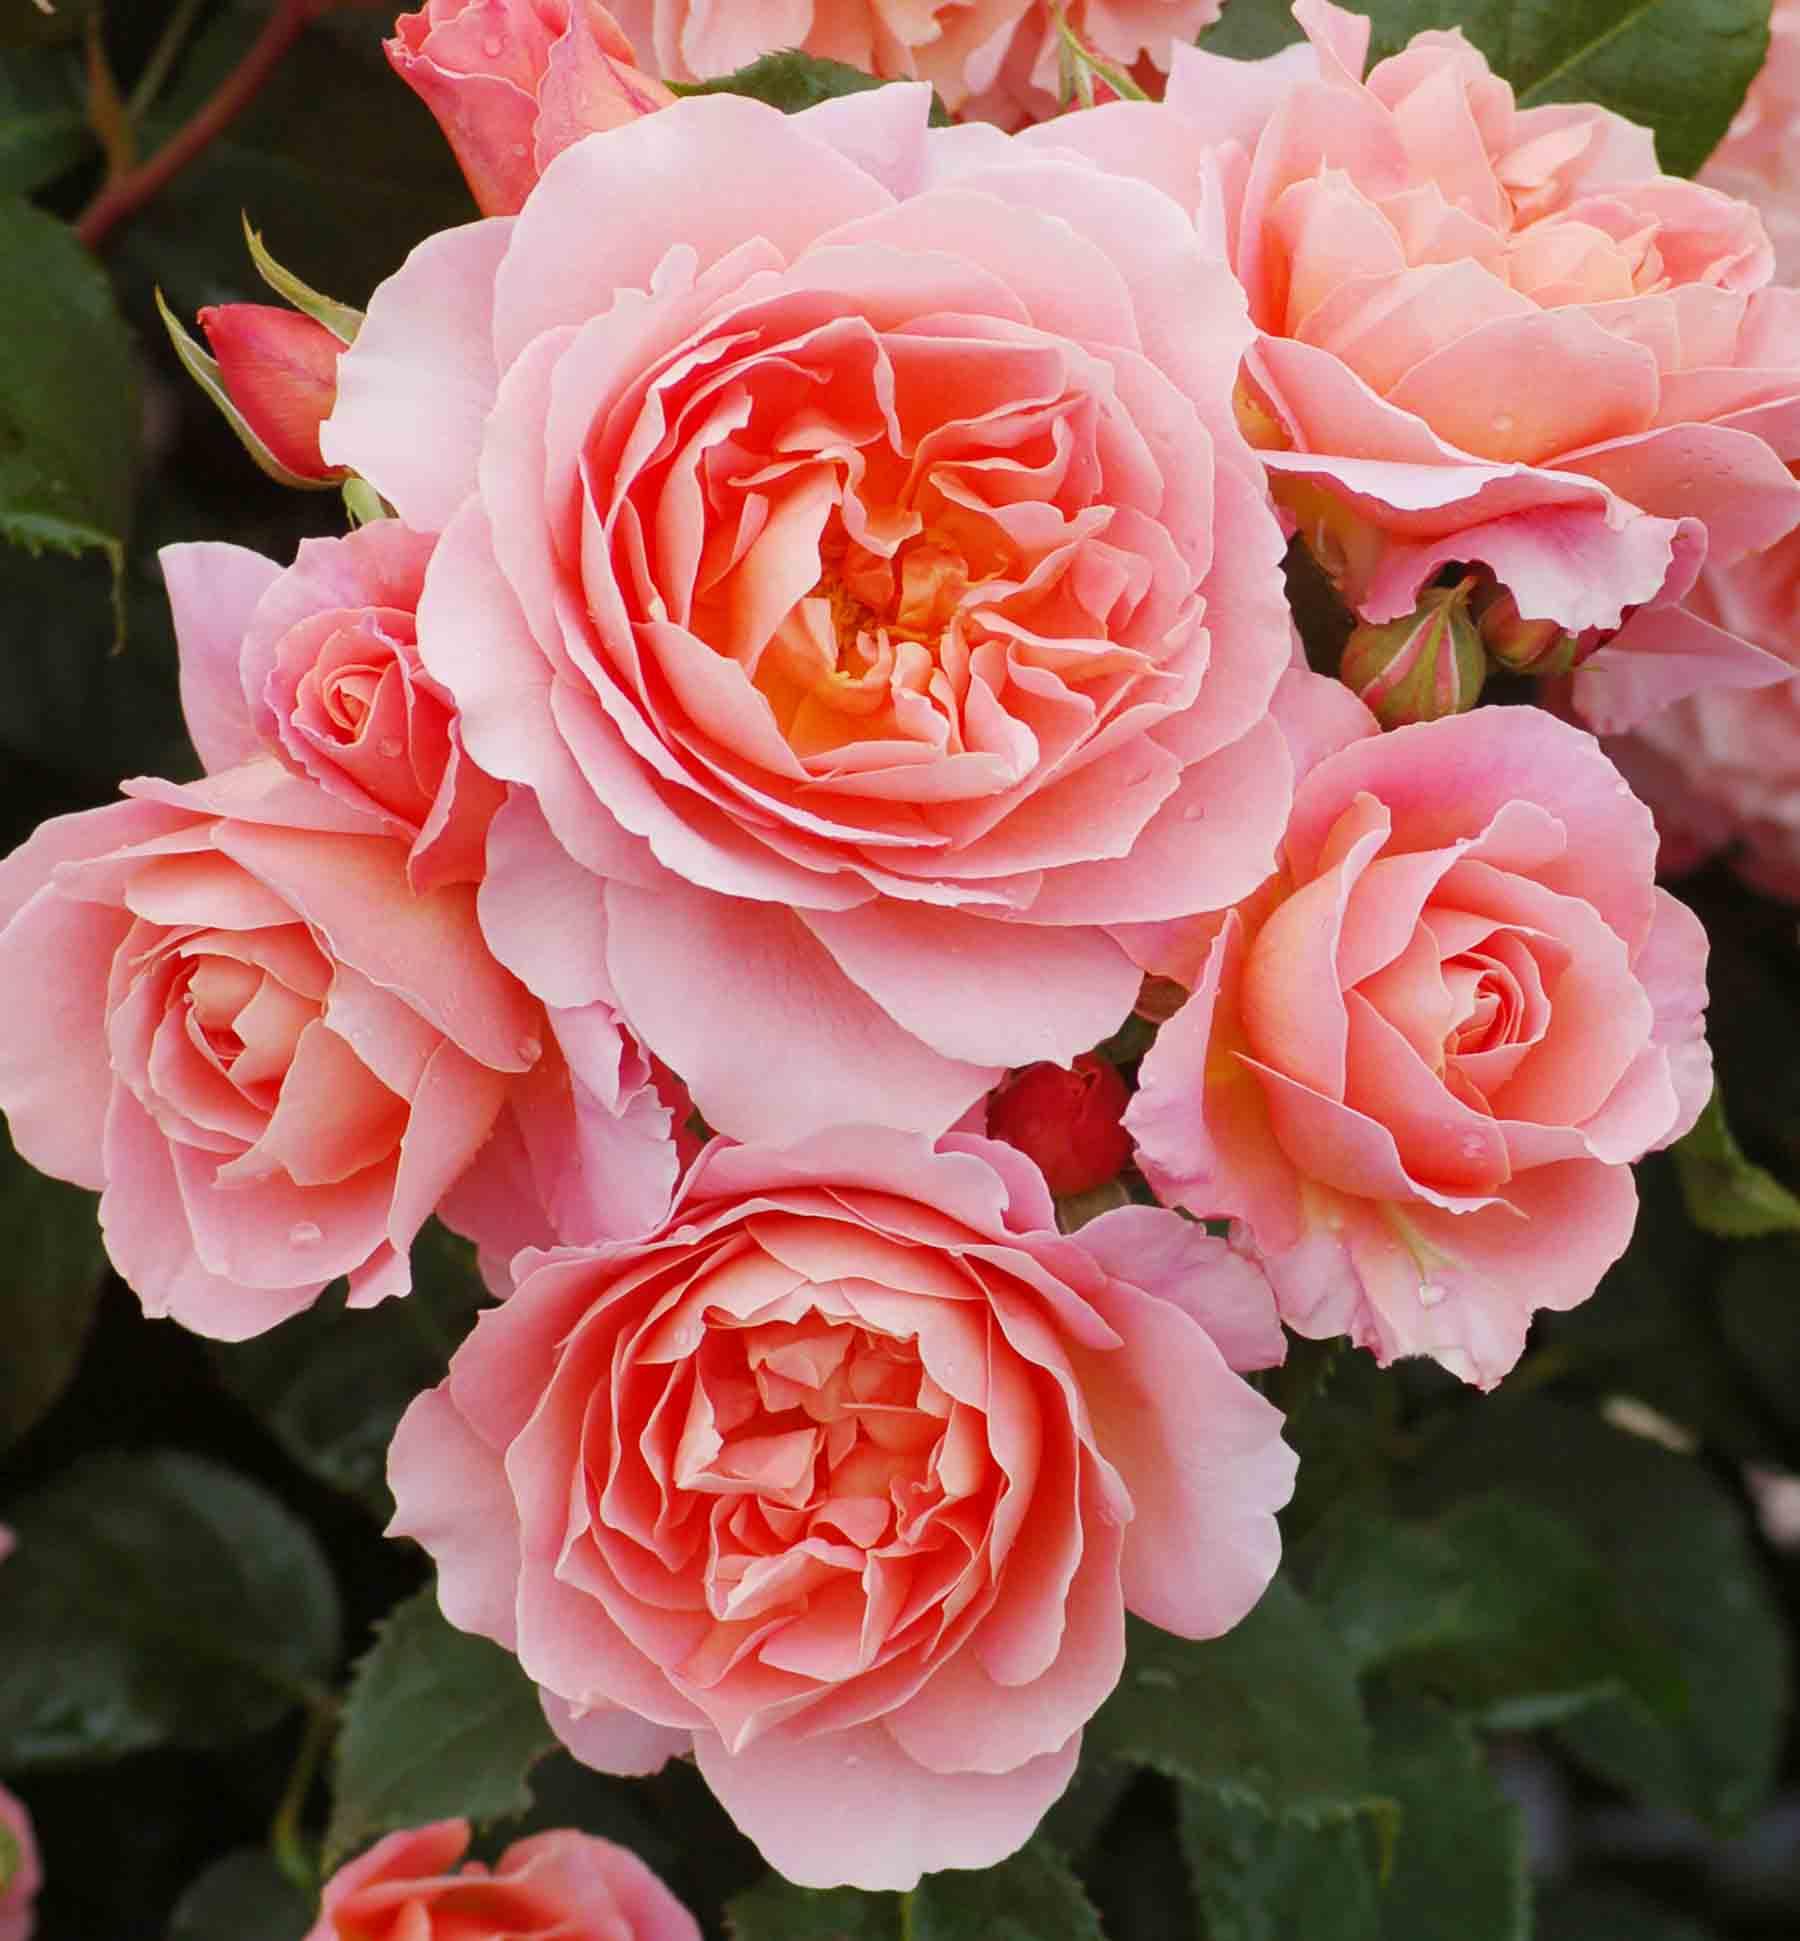 roses-reduced-1.jpg